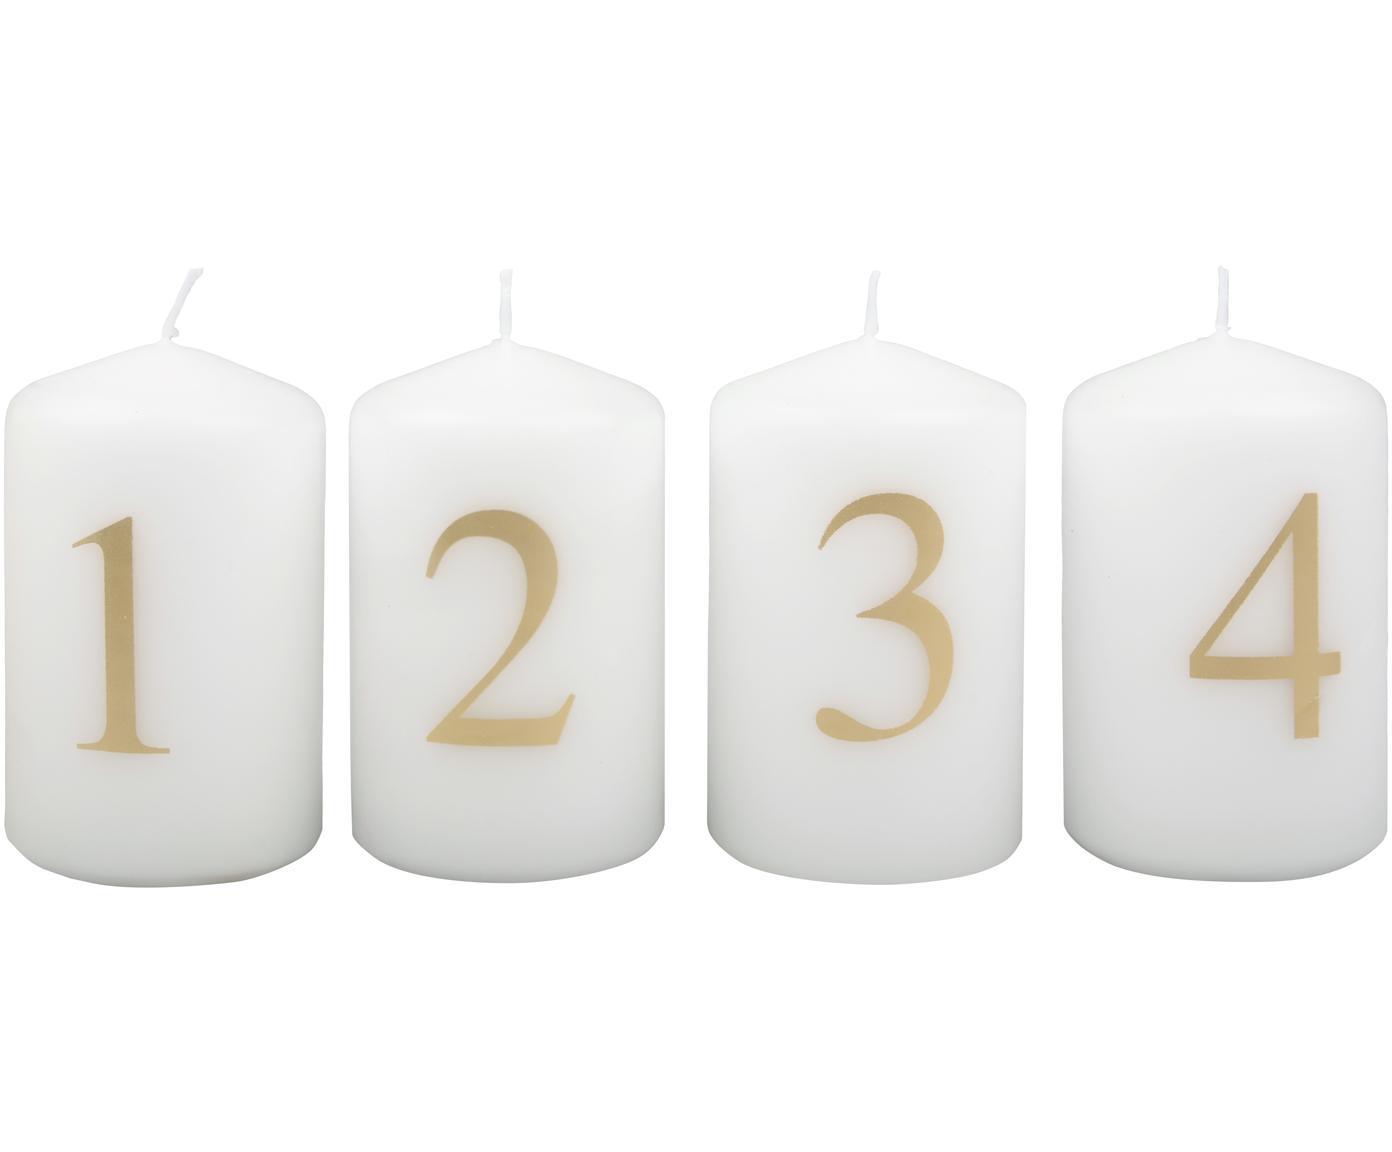 Adventkaarsen set Aven, 4-delig, Paraffinewas, Wit, goudkleurig, Ø 6 cm